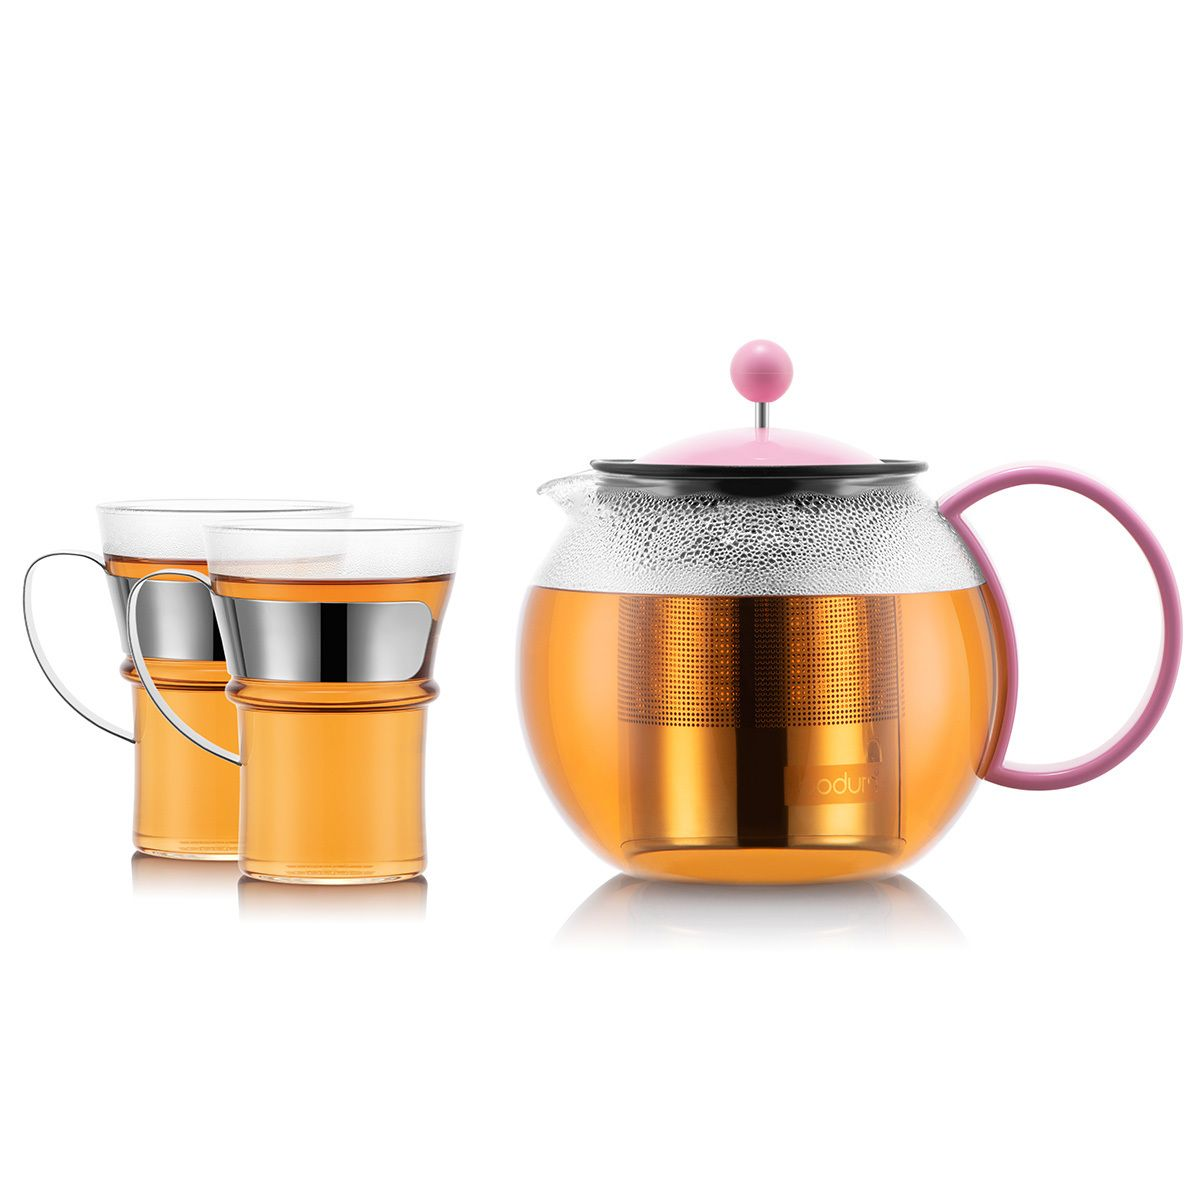 Tea Press and Mugs ASSAM Bodum